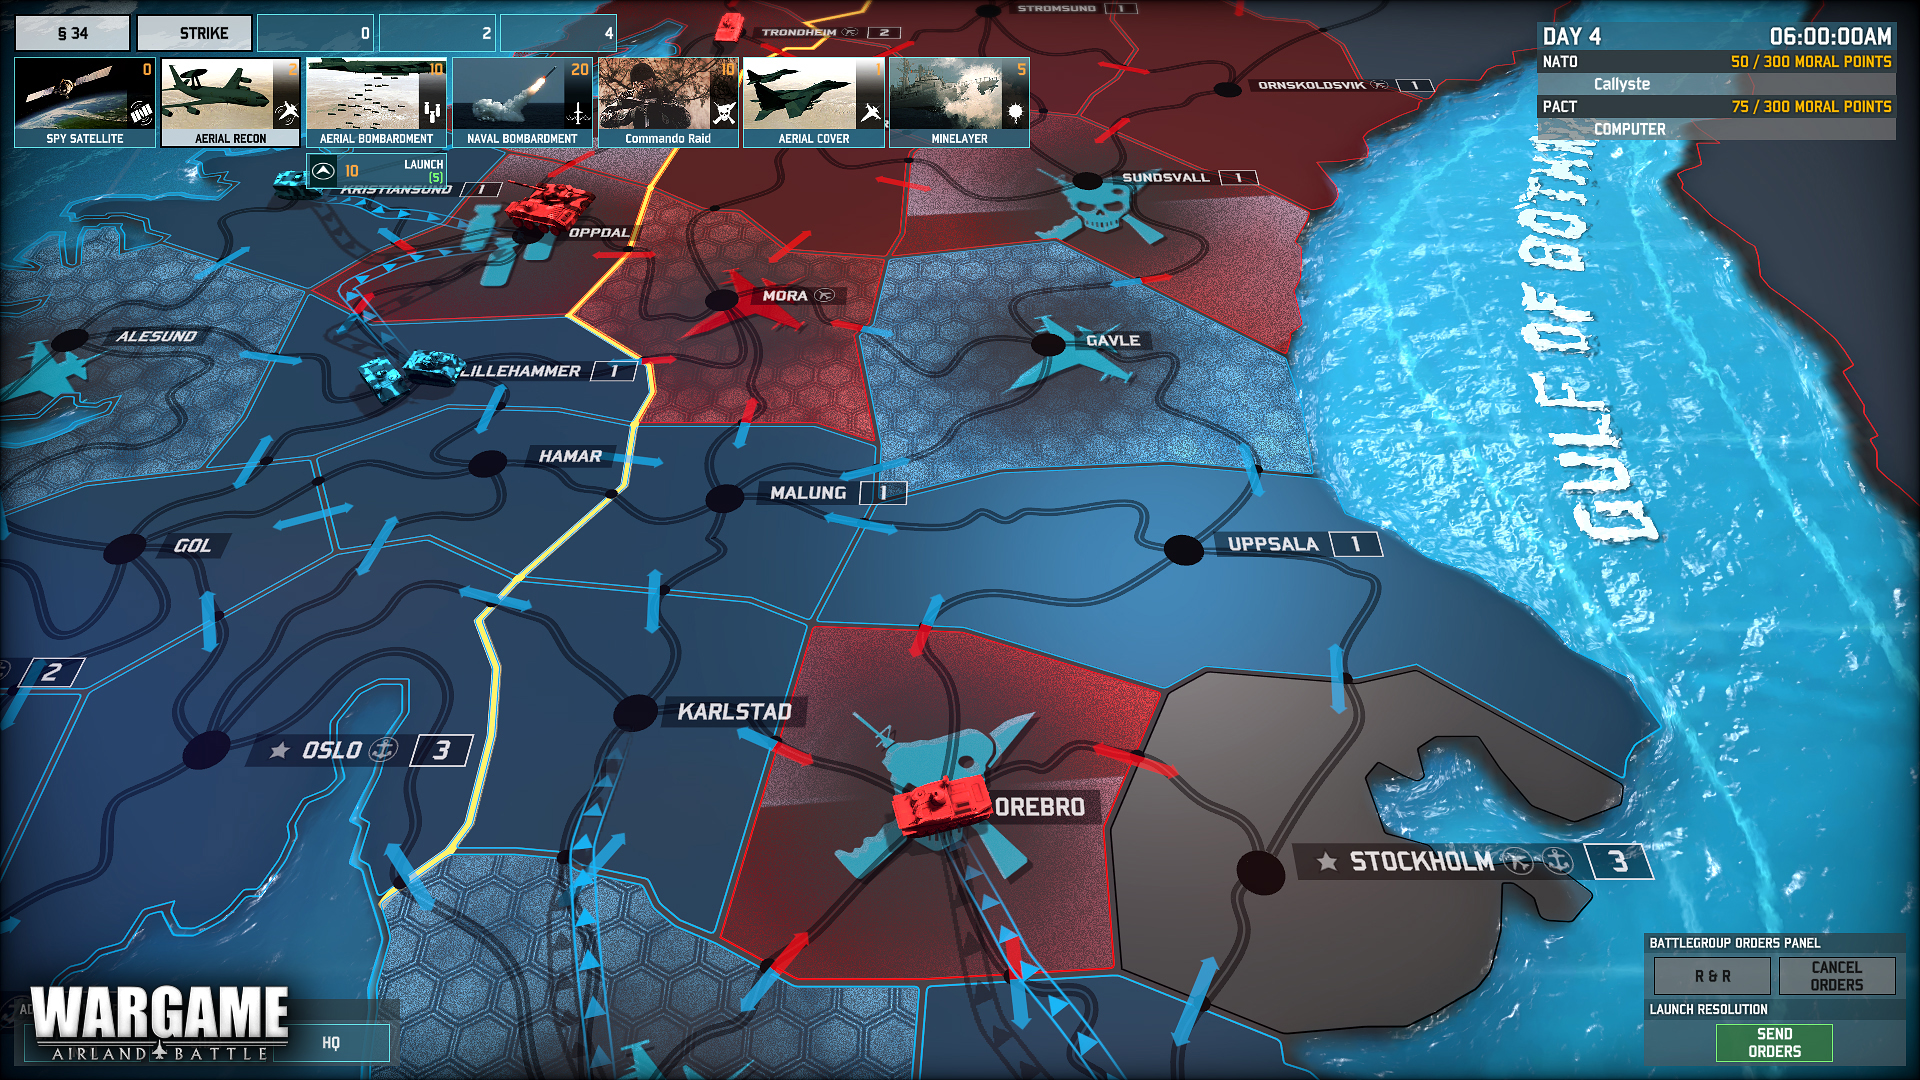 Strategie Wargame: Airland Battle odhalila kampaň 81920